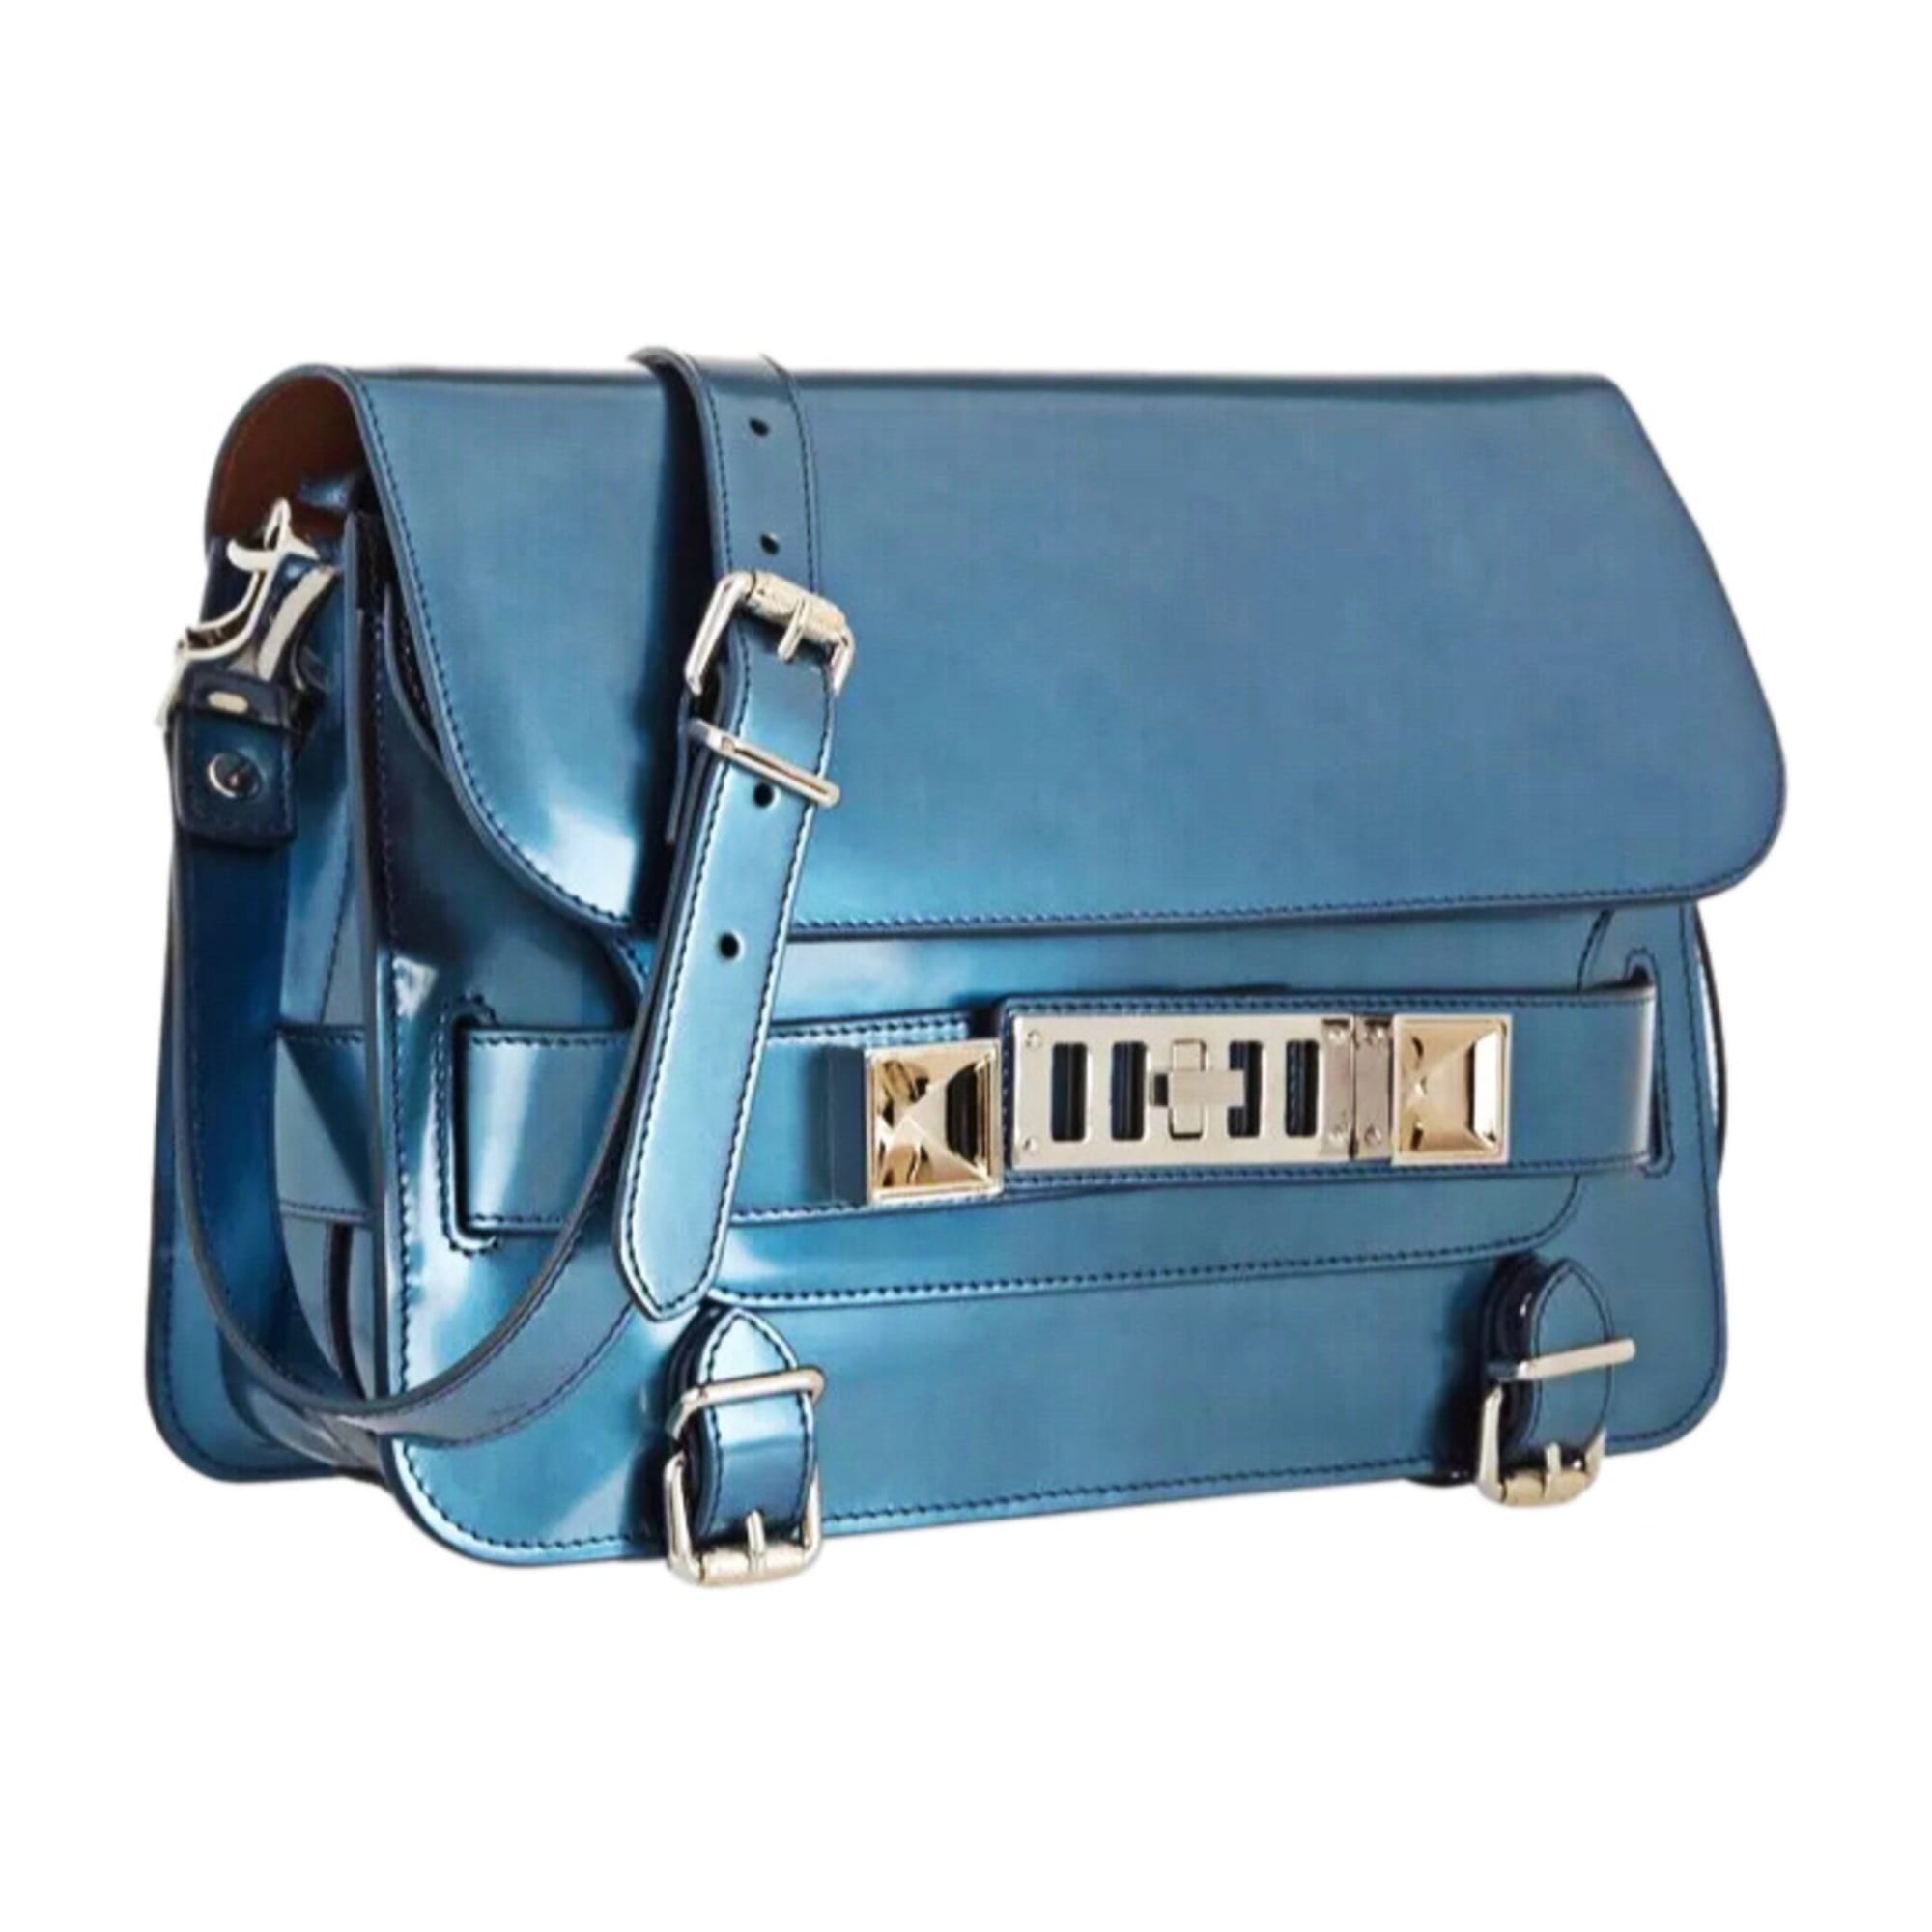 Sac à main en cuir PROENZA SCHOULER Bleu, bleu marine, bleu turquoise